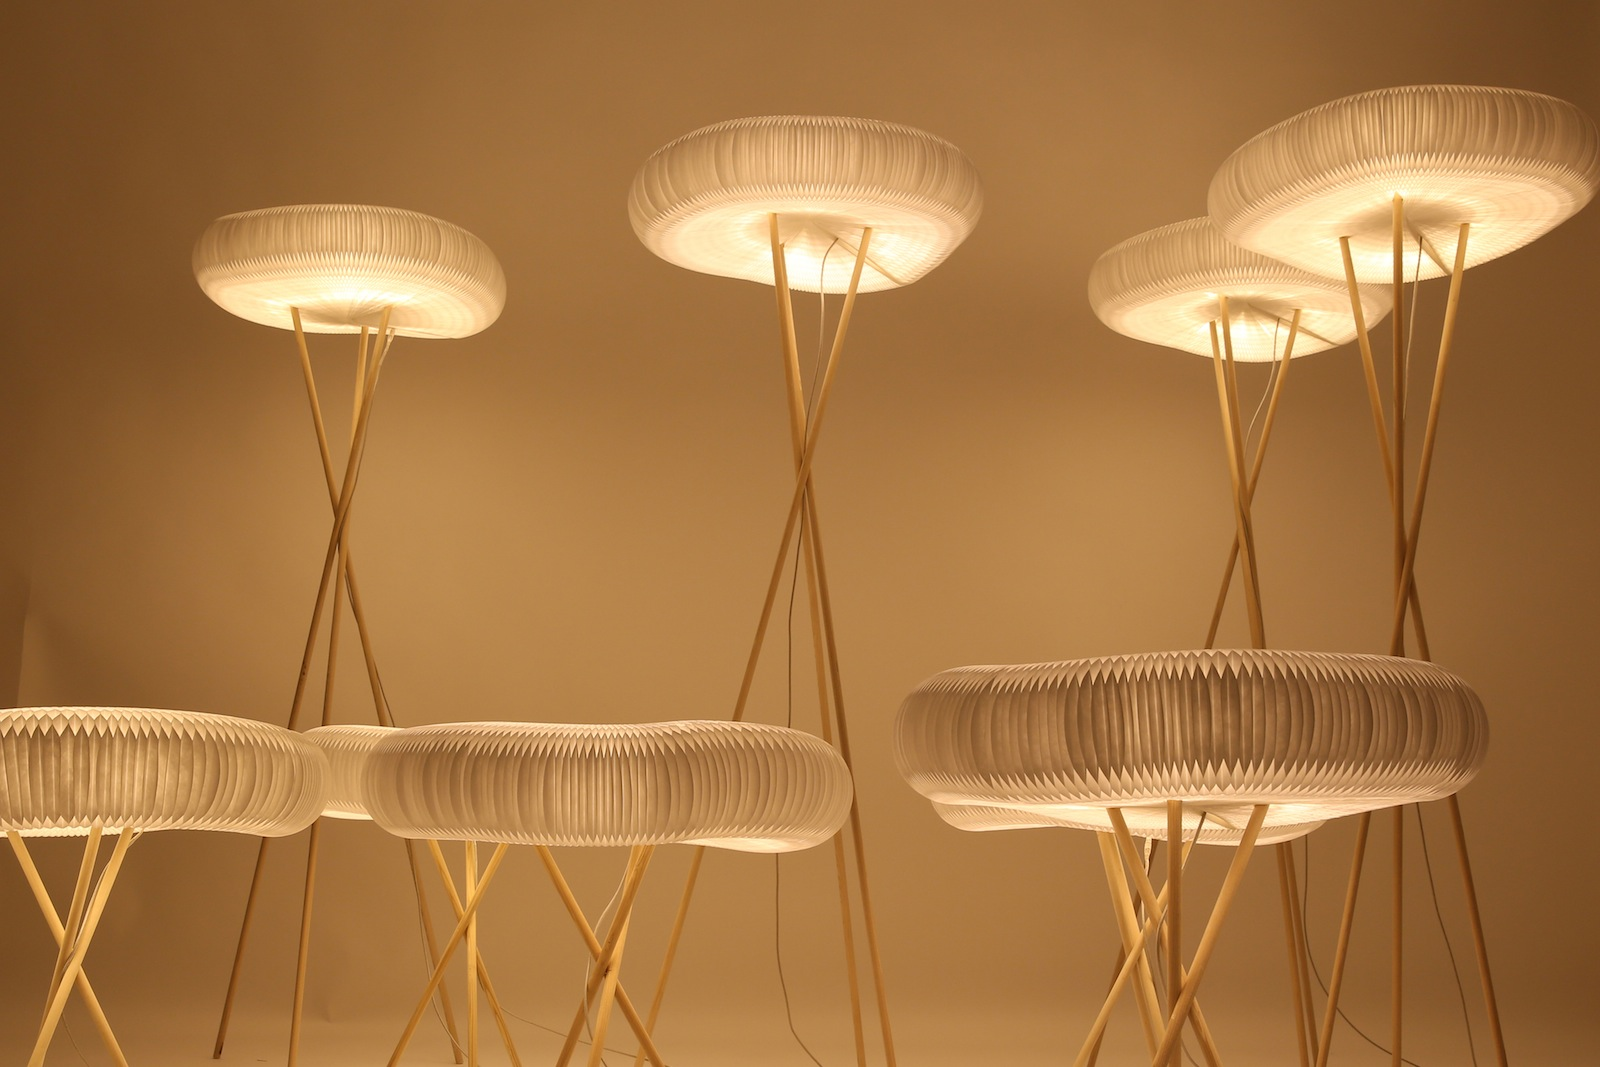 molo lamp lit